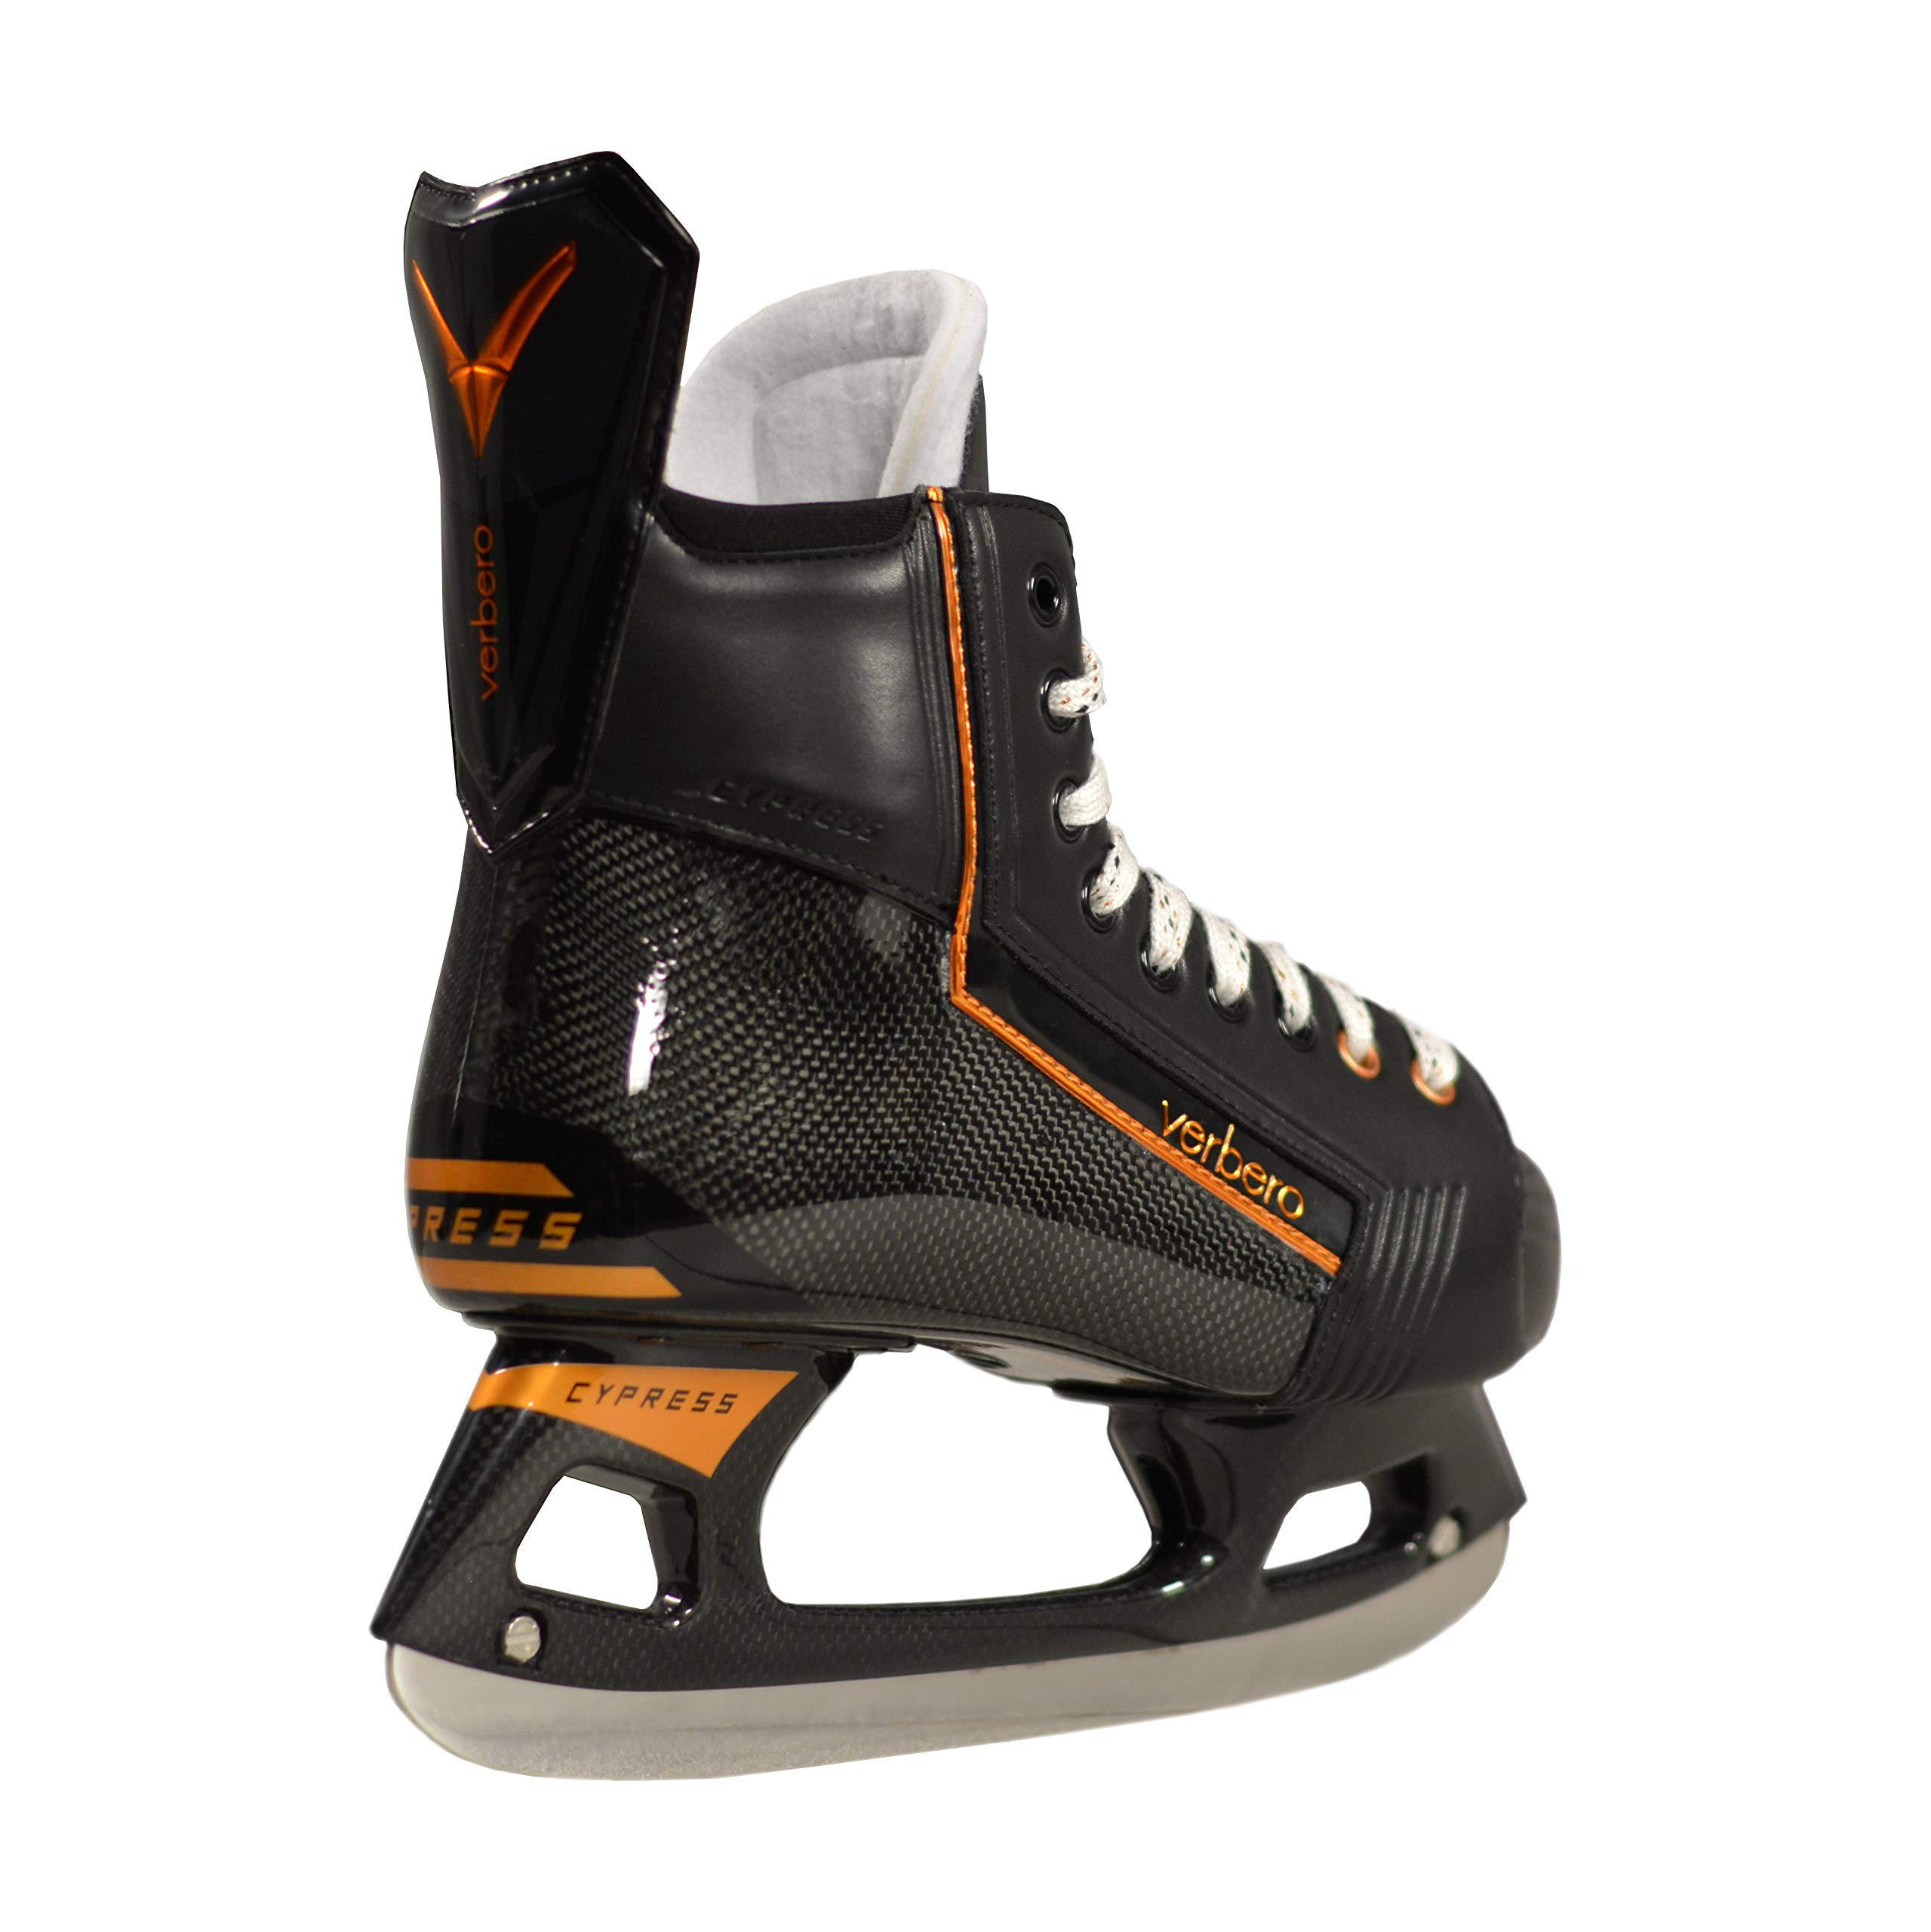 VERBERO Cypress Pro+ Ice Hockey Skate (Black 6.0) by VERBERO (Image #2)